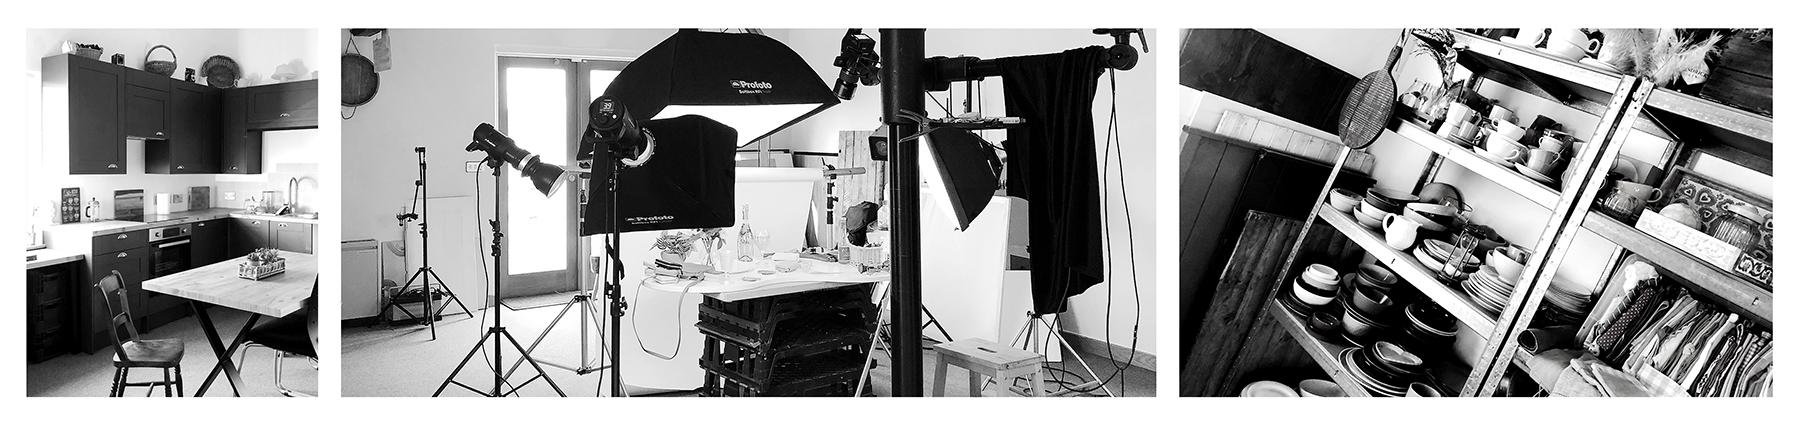 Waltham Court Studio